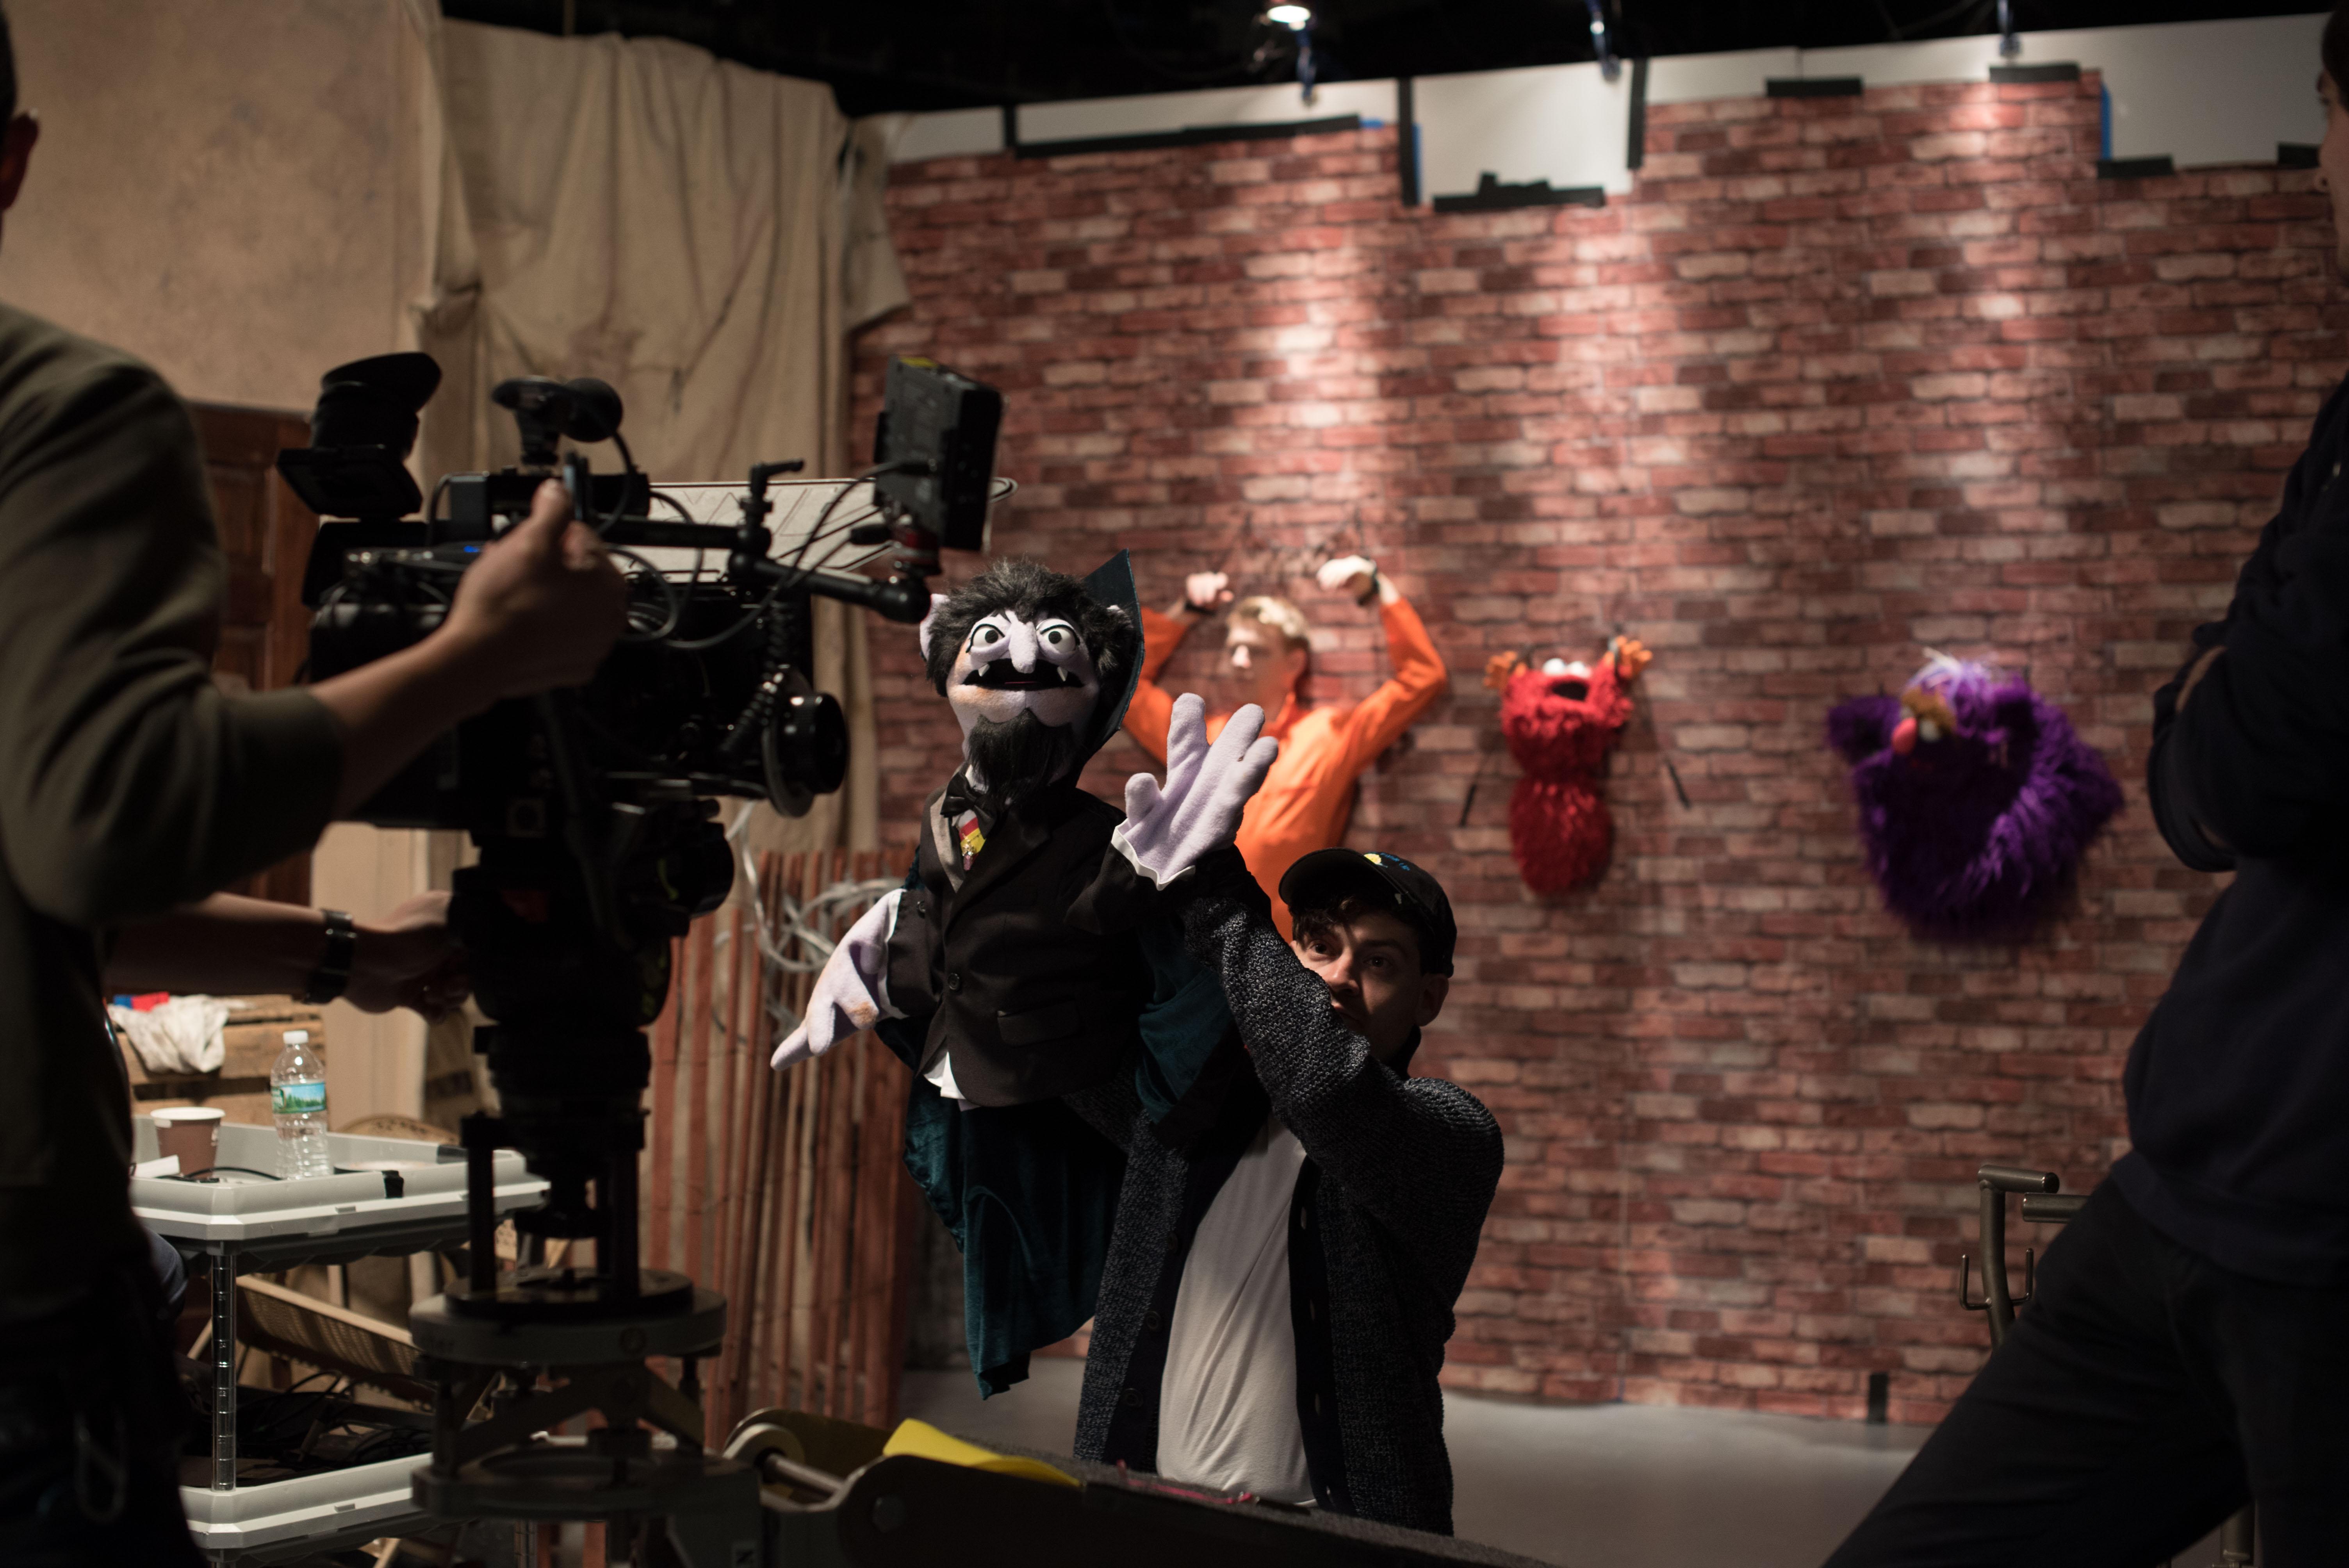 Jihadi Street (Sesame Street Parody)